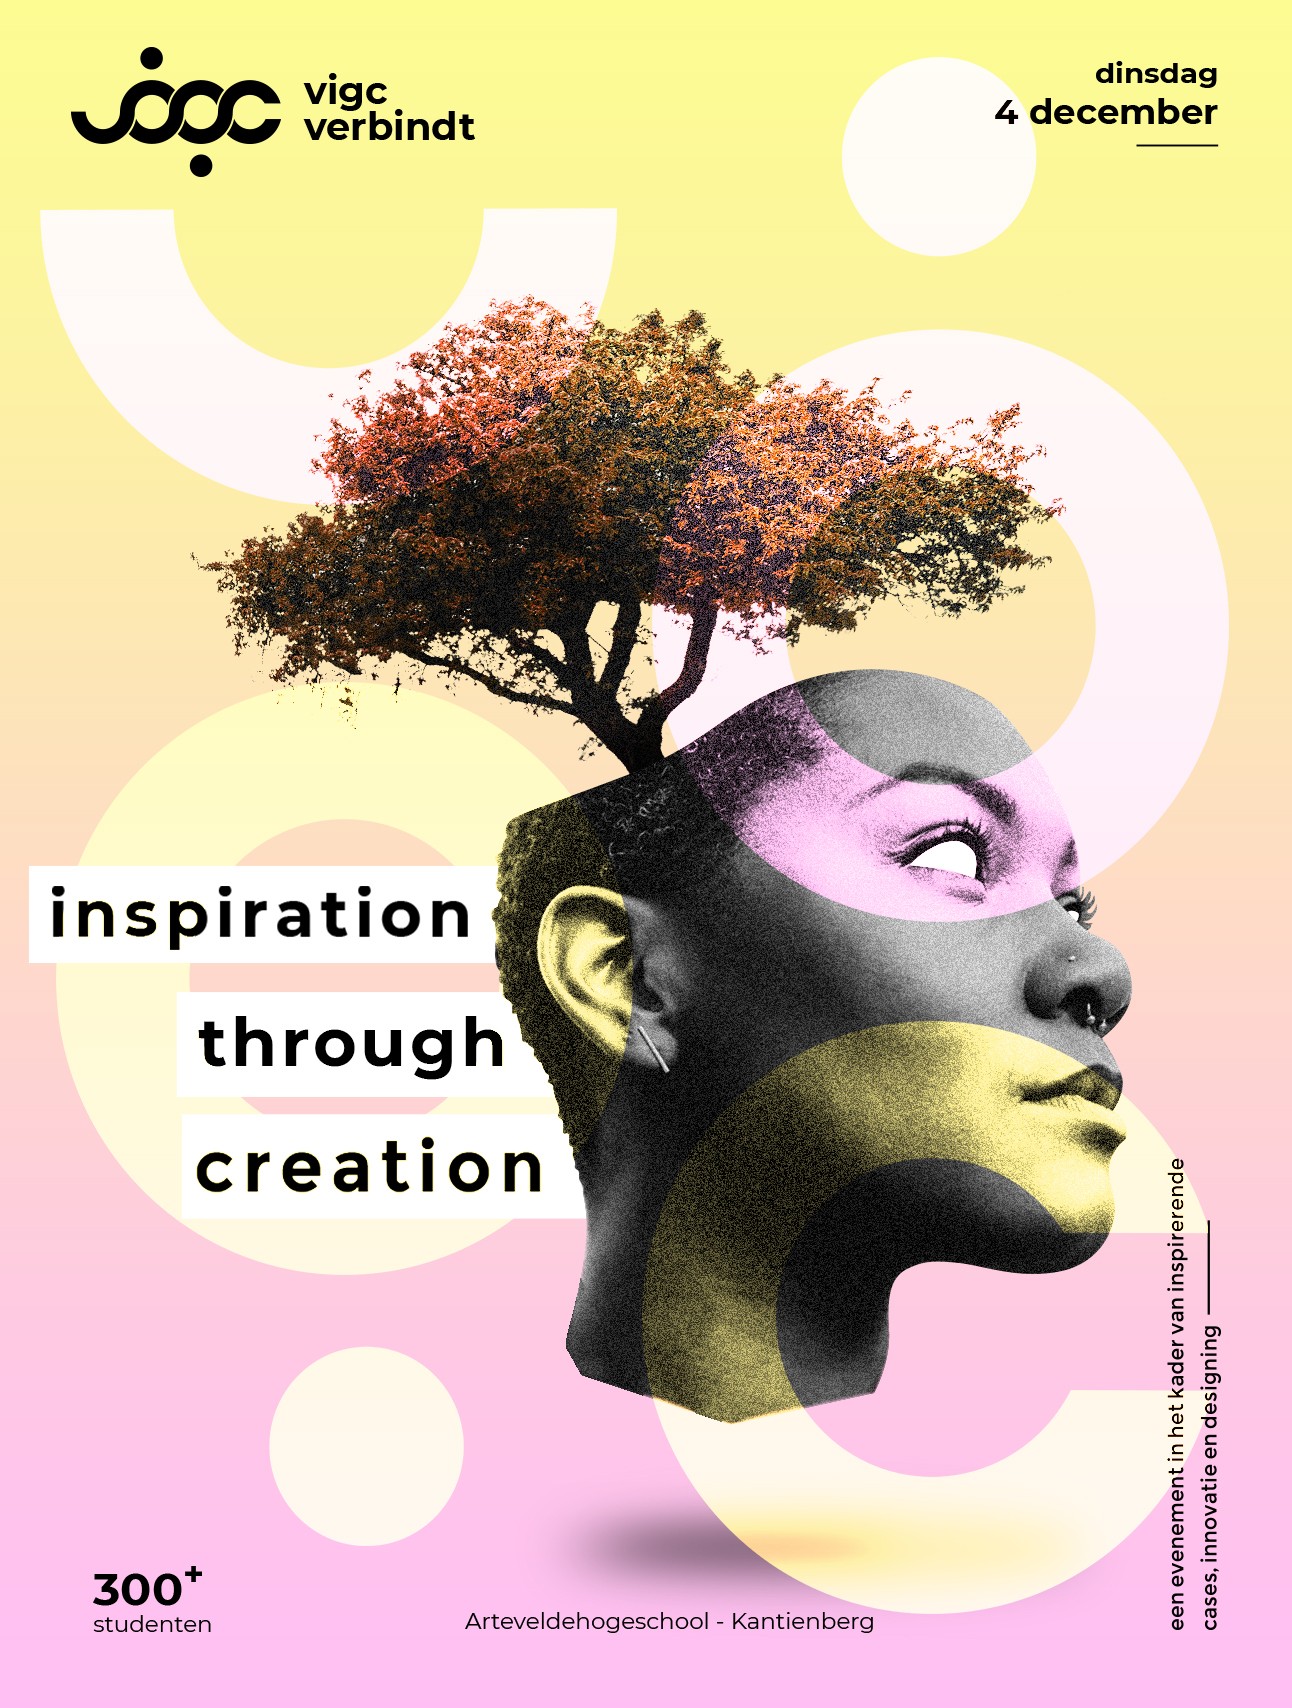 VIGC Verbindt 2018: Inspiration through Creation